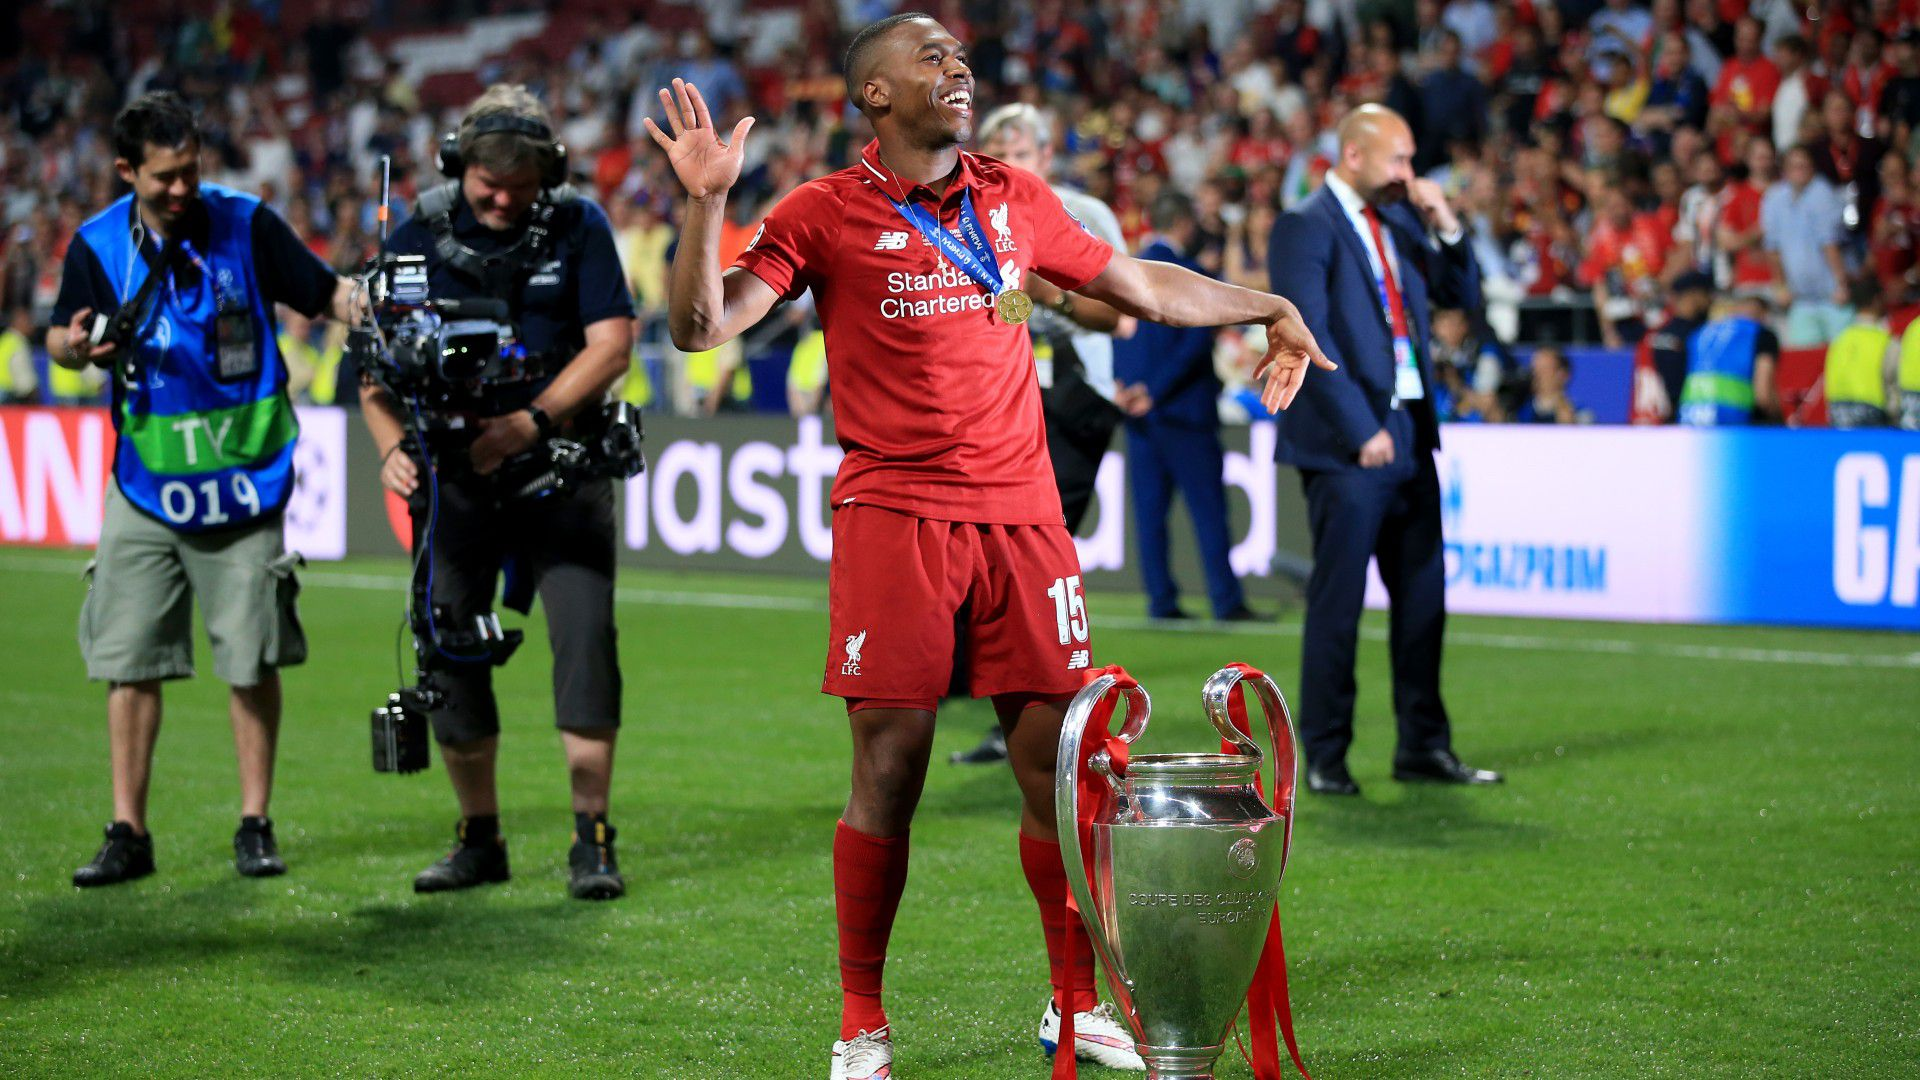 Perth Glory announce signing of former Liverpool striker Daniel Sturridge